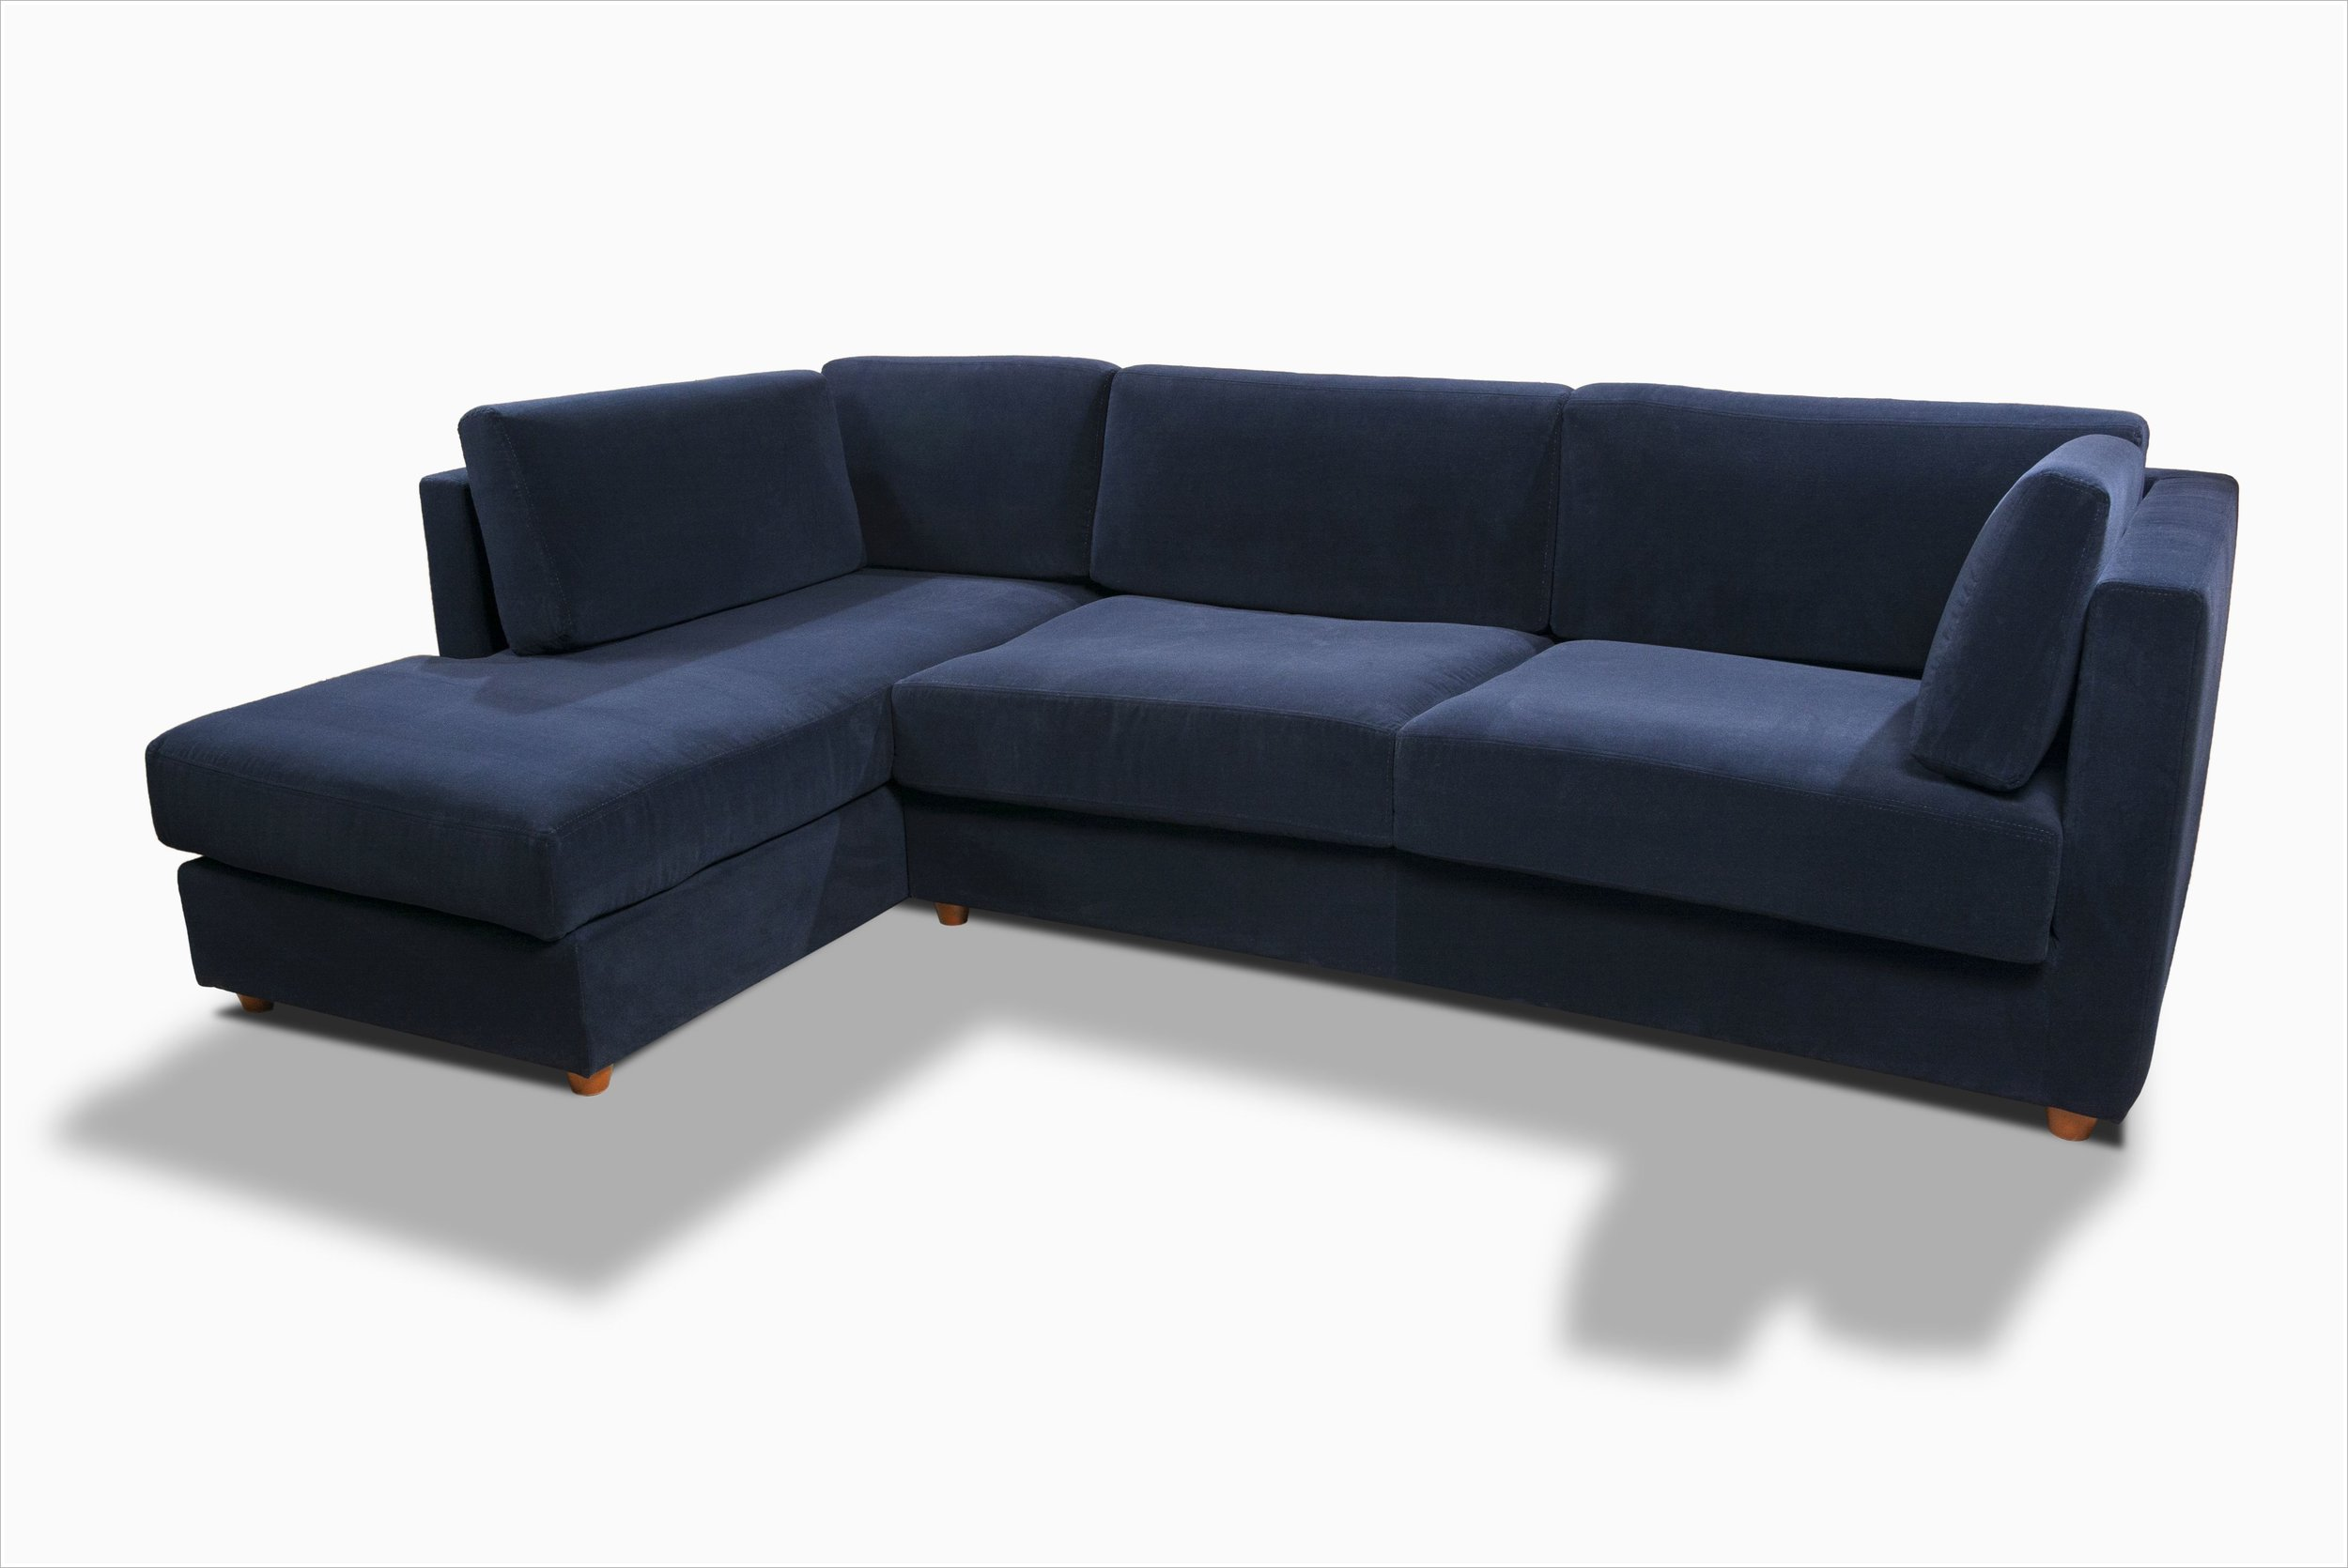 Custom Sectional Sleeper Sofa